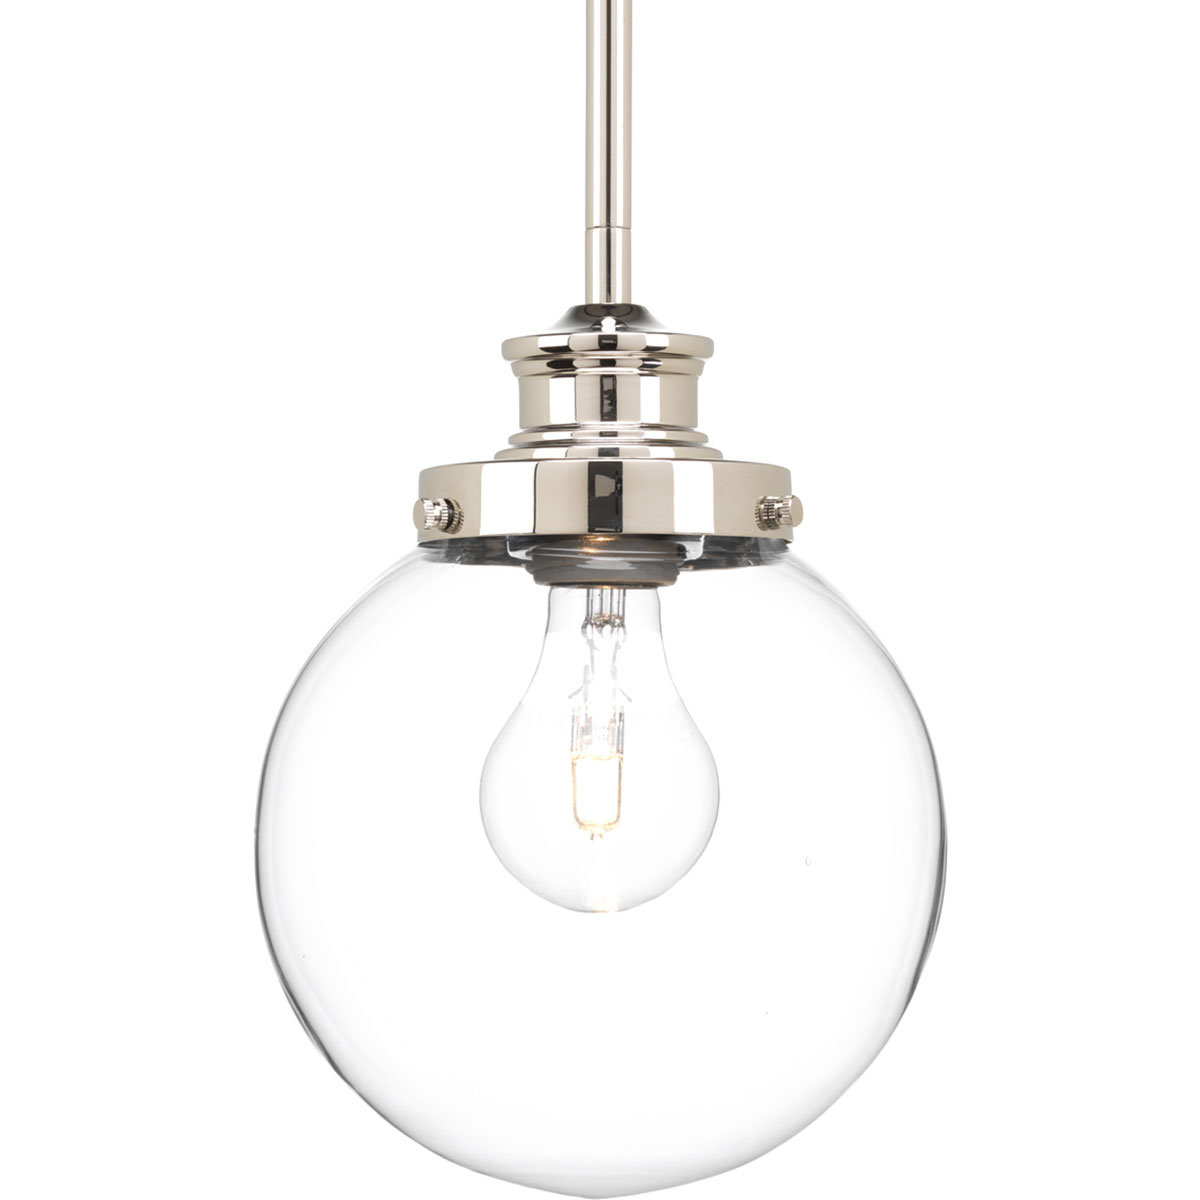 Cayden 1 Light Single Globe Pendant Regarding 1 Light Globe Pendants (View 10 of 30)